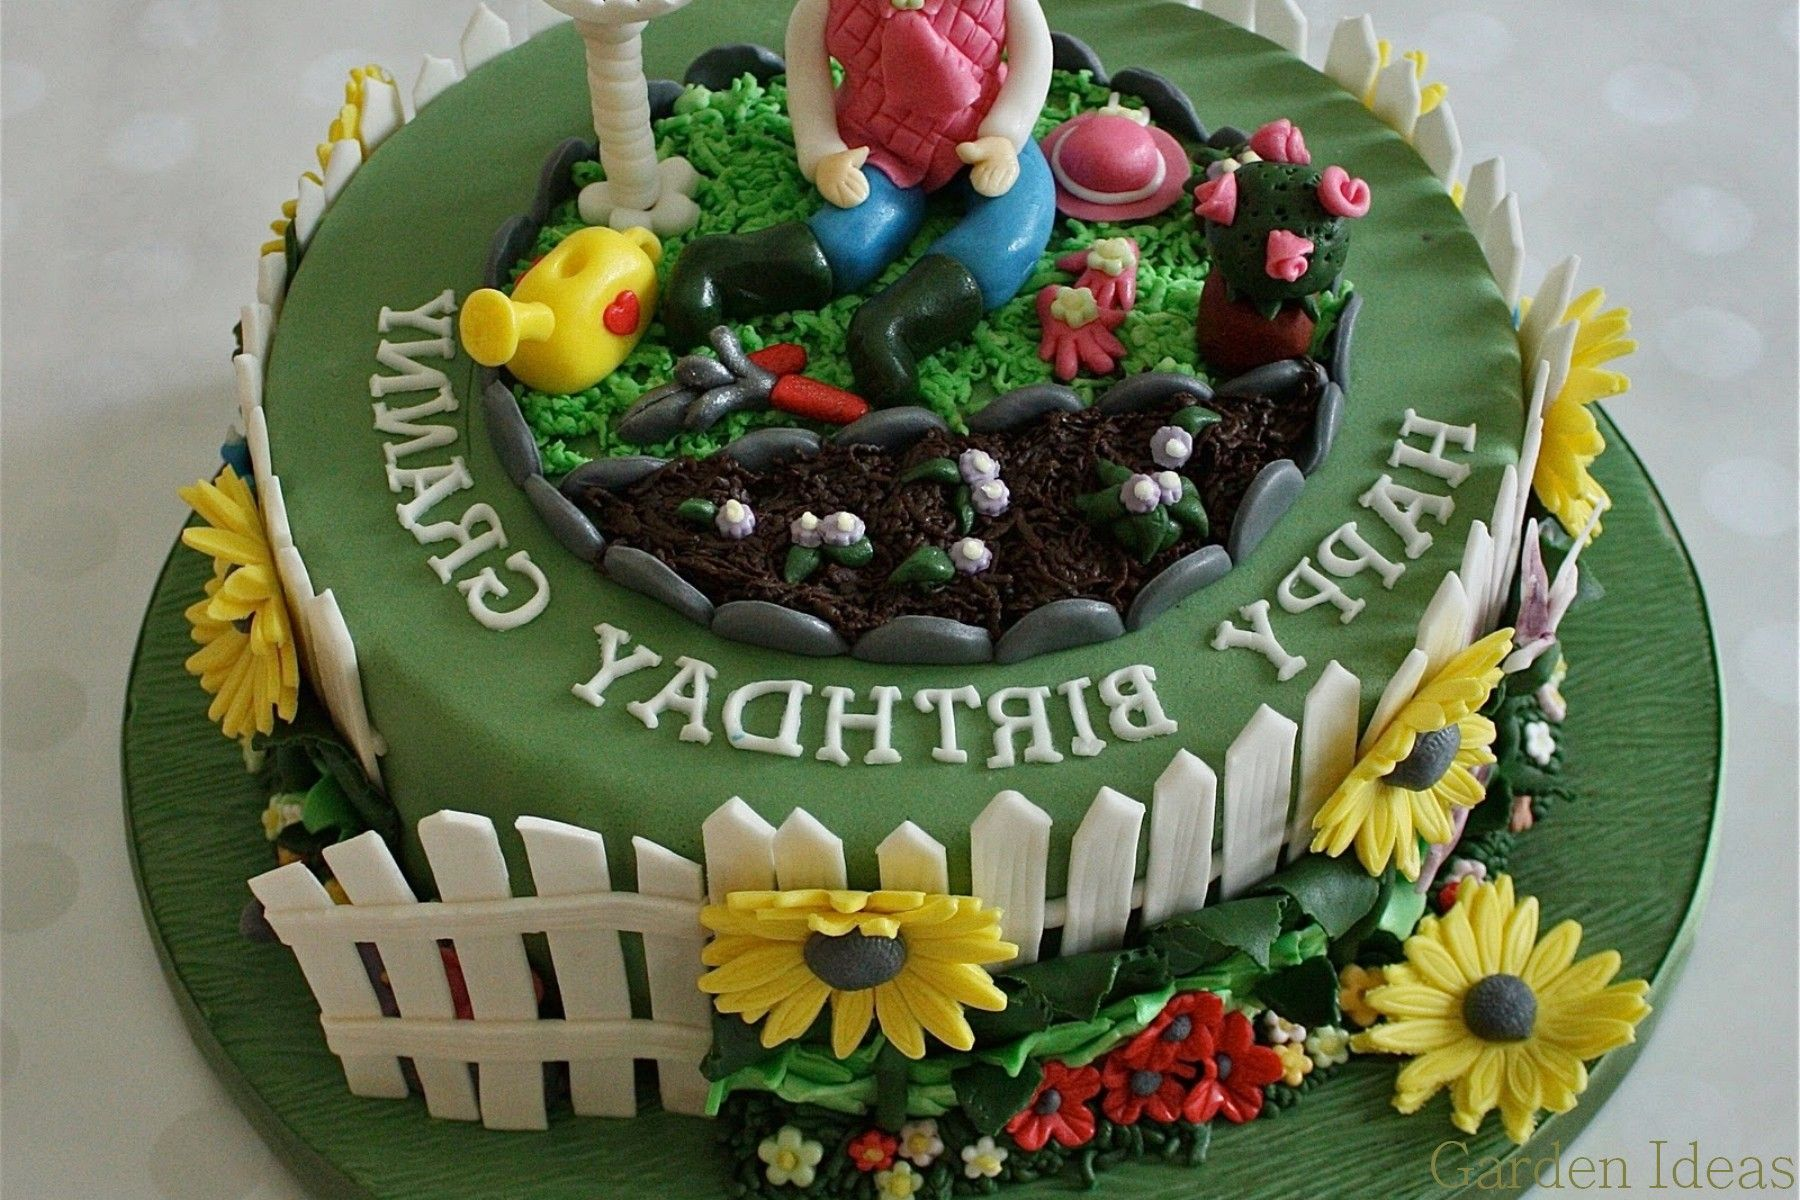 Excellent Garden Cake Ideas Photo Container Gardens Wonderful Design Ideas Landscape Design Plants Grasses Garden Cakes Garden Birthday Cake Allotment Cake